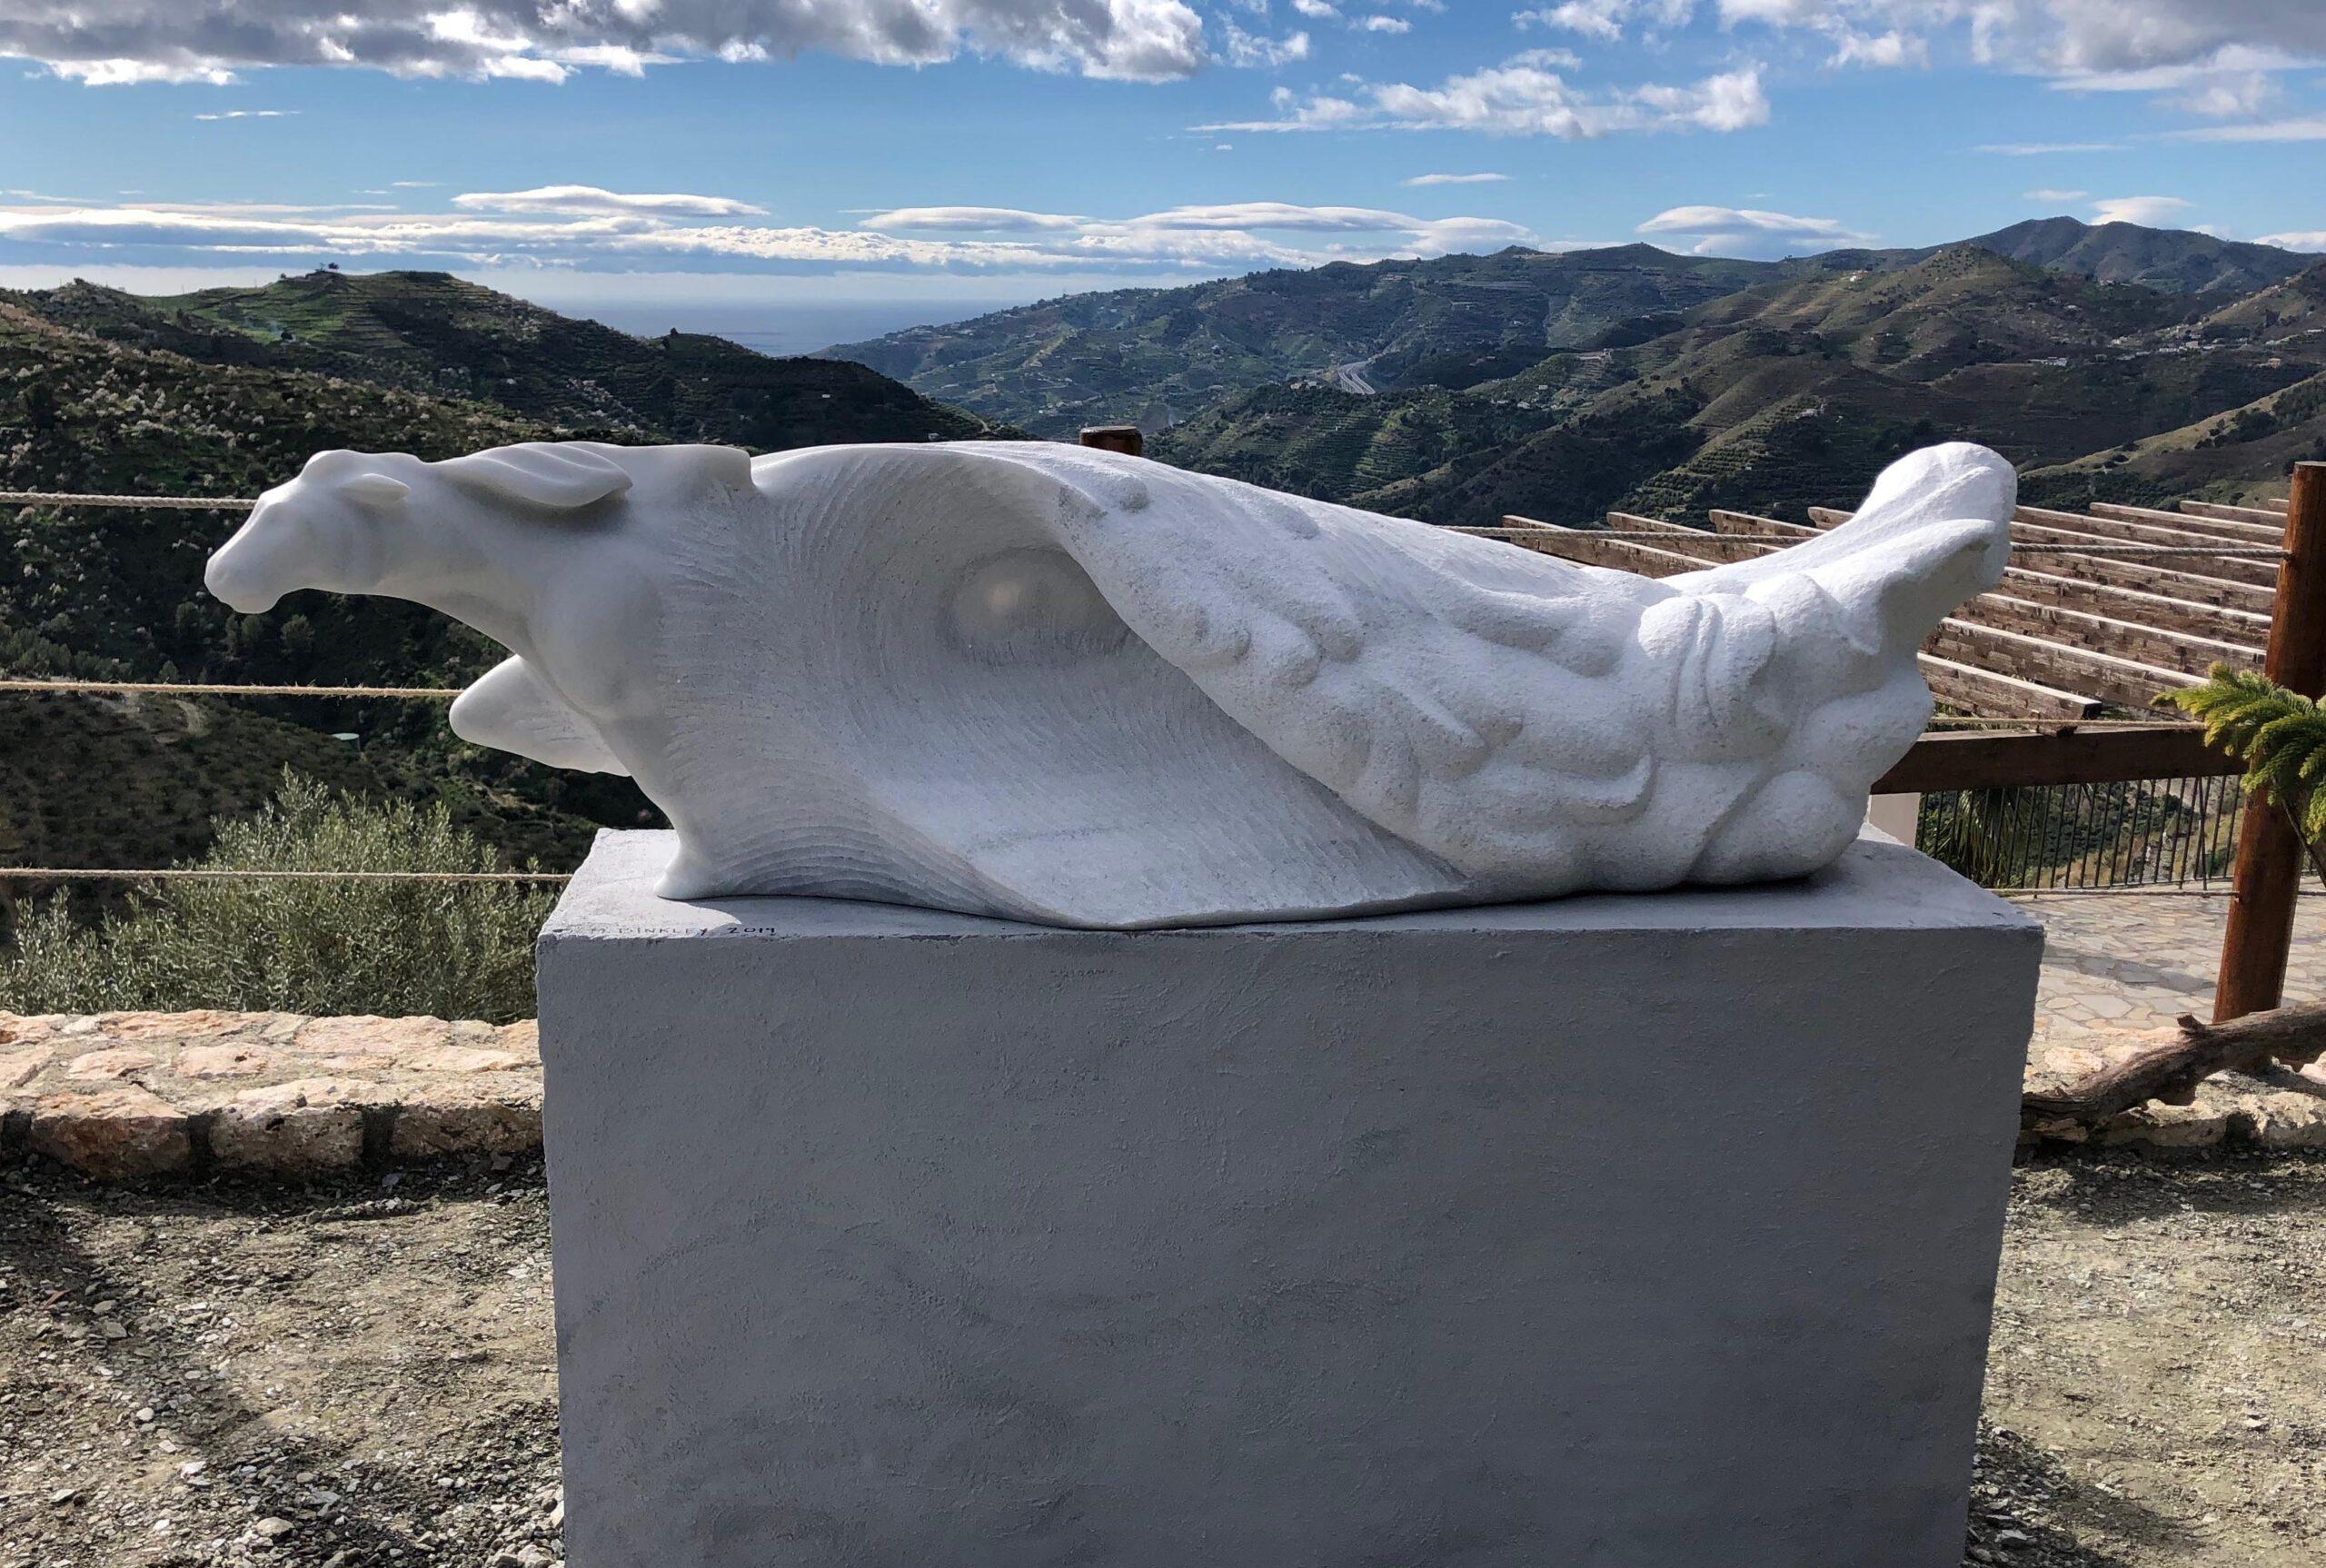 michael binkley sculptor stone sculpture artist horse marble wildlife statue vancouver canada